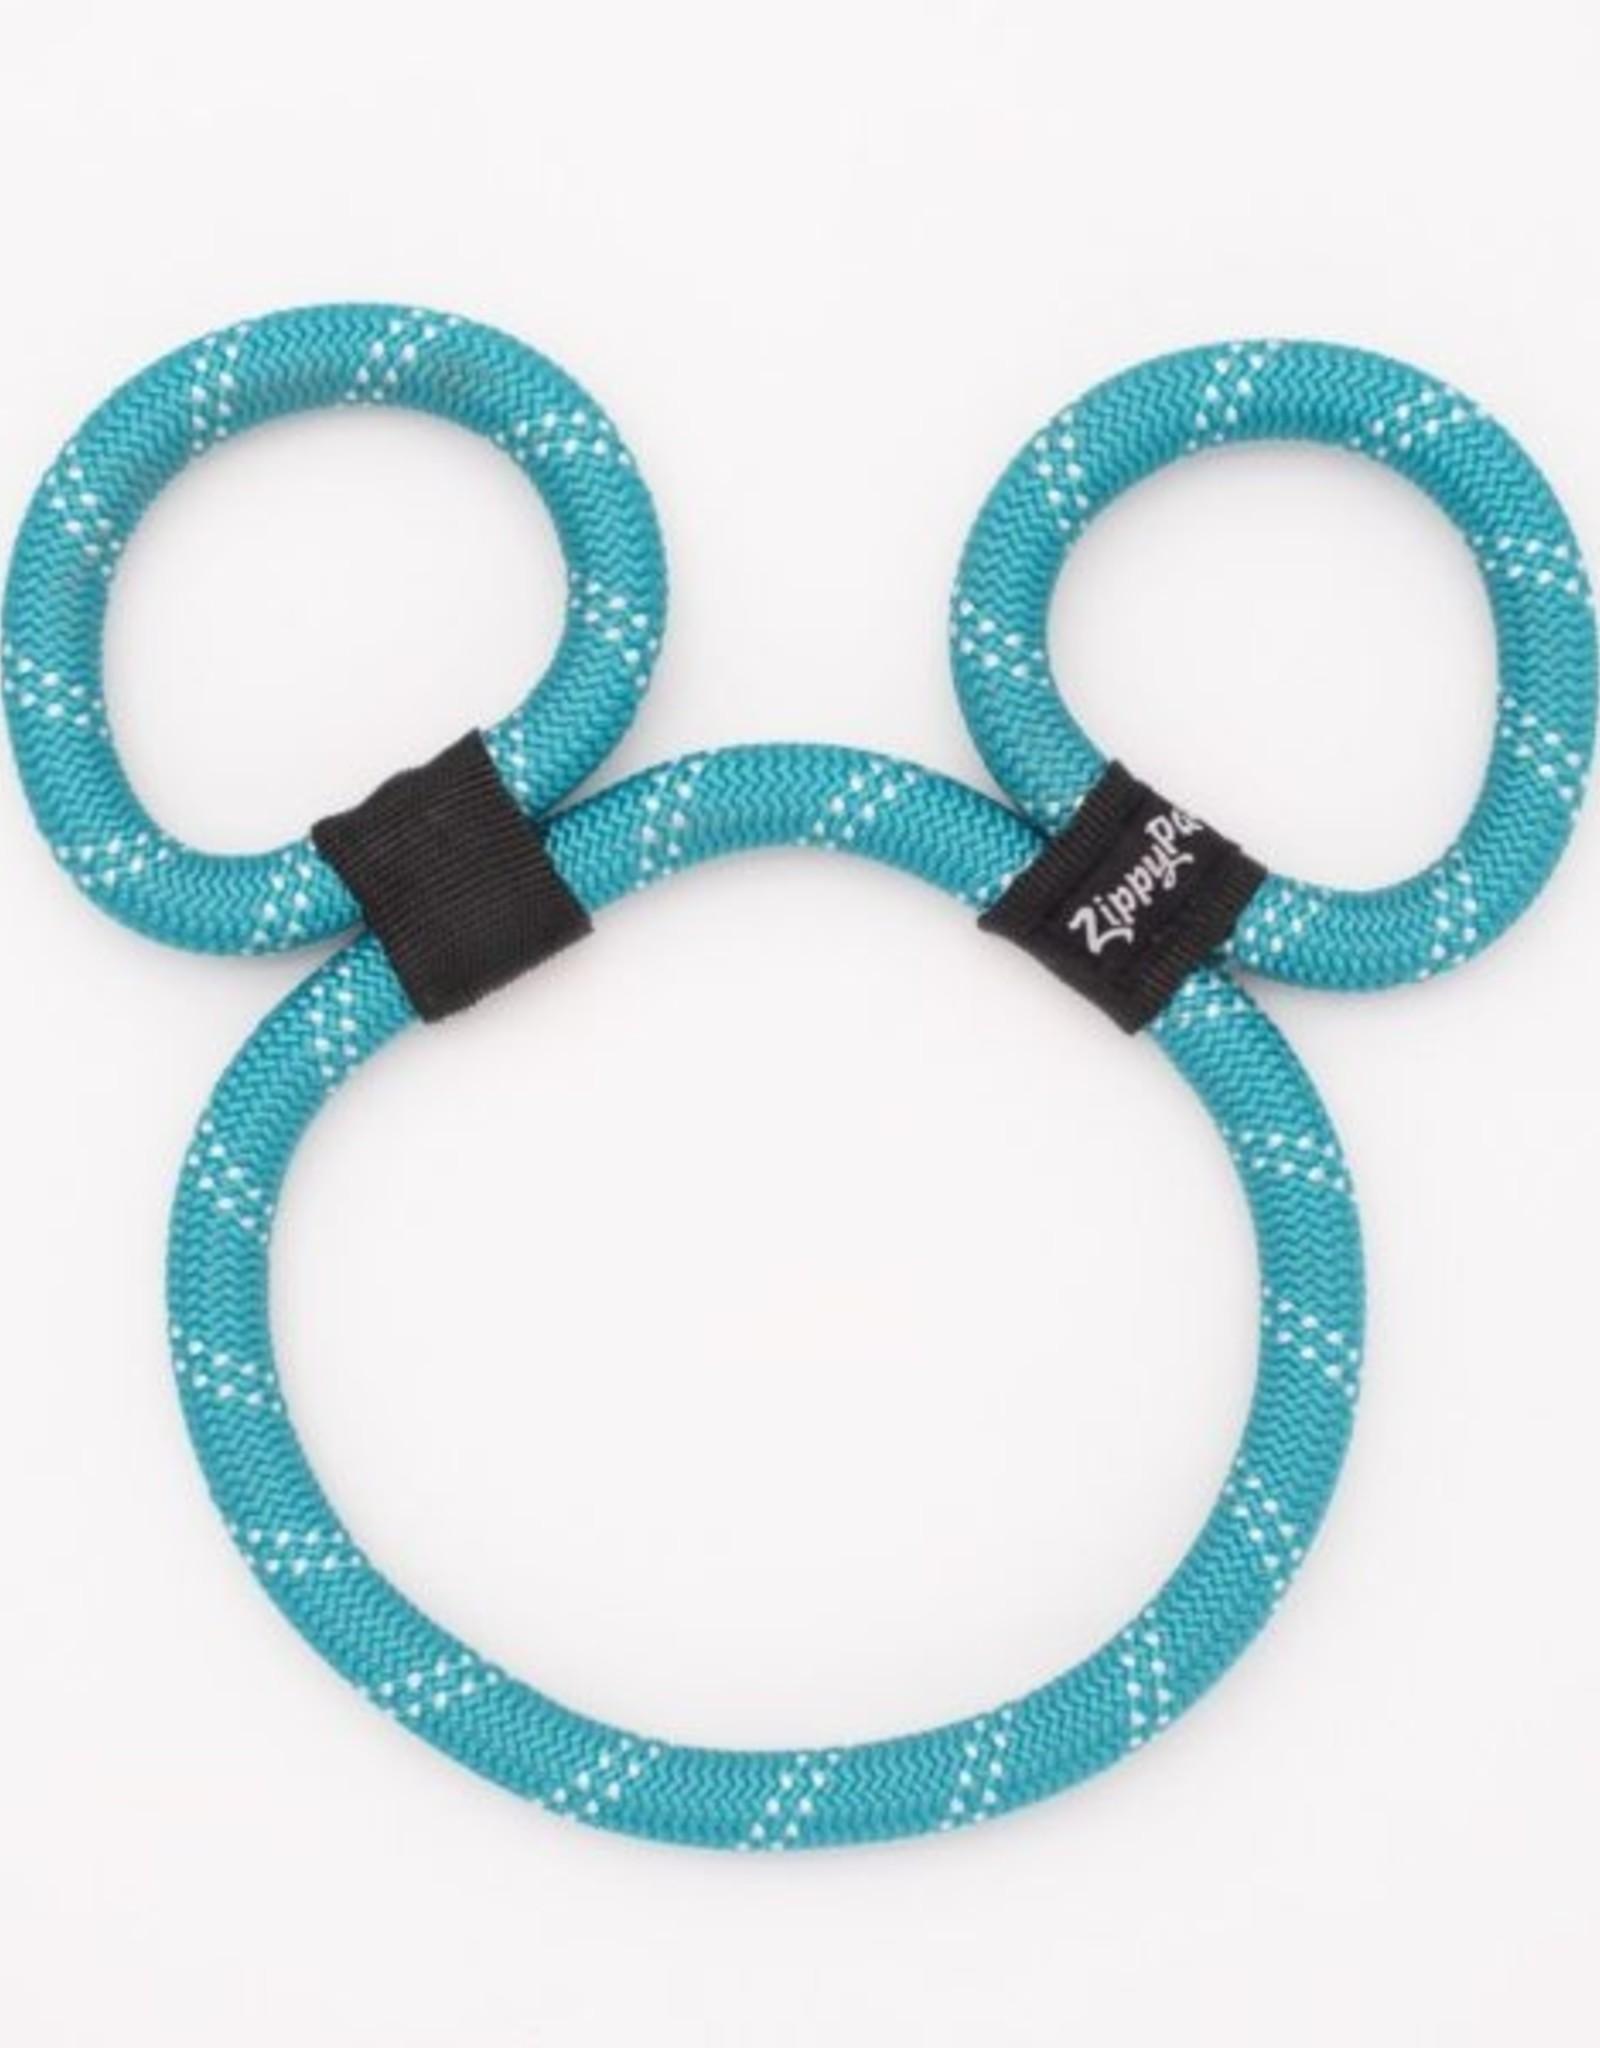 ZippyPaws Zippy Rope - Teal Bear